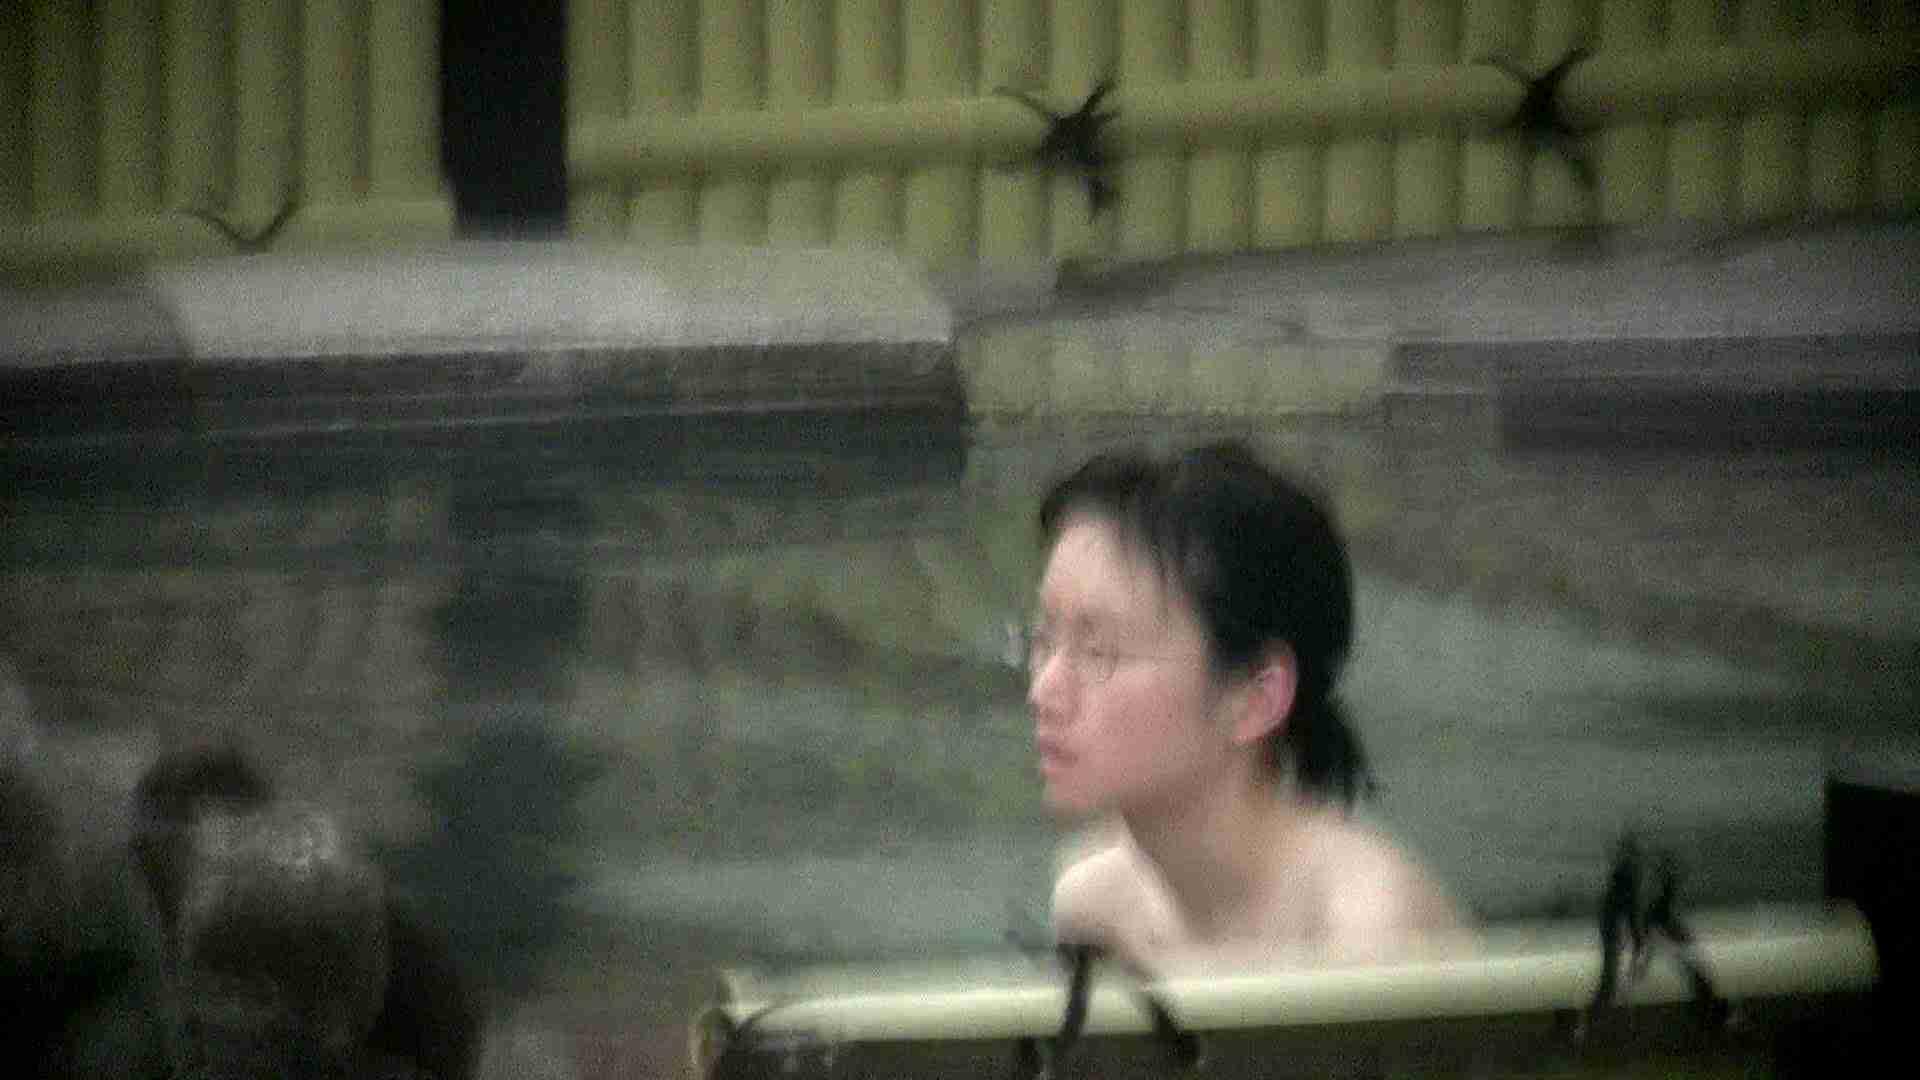 Aquaな露天風呂Vol.684 OLのエロ生活   露天風呂  59連発 4